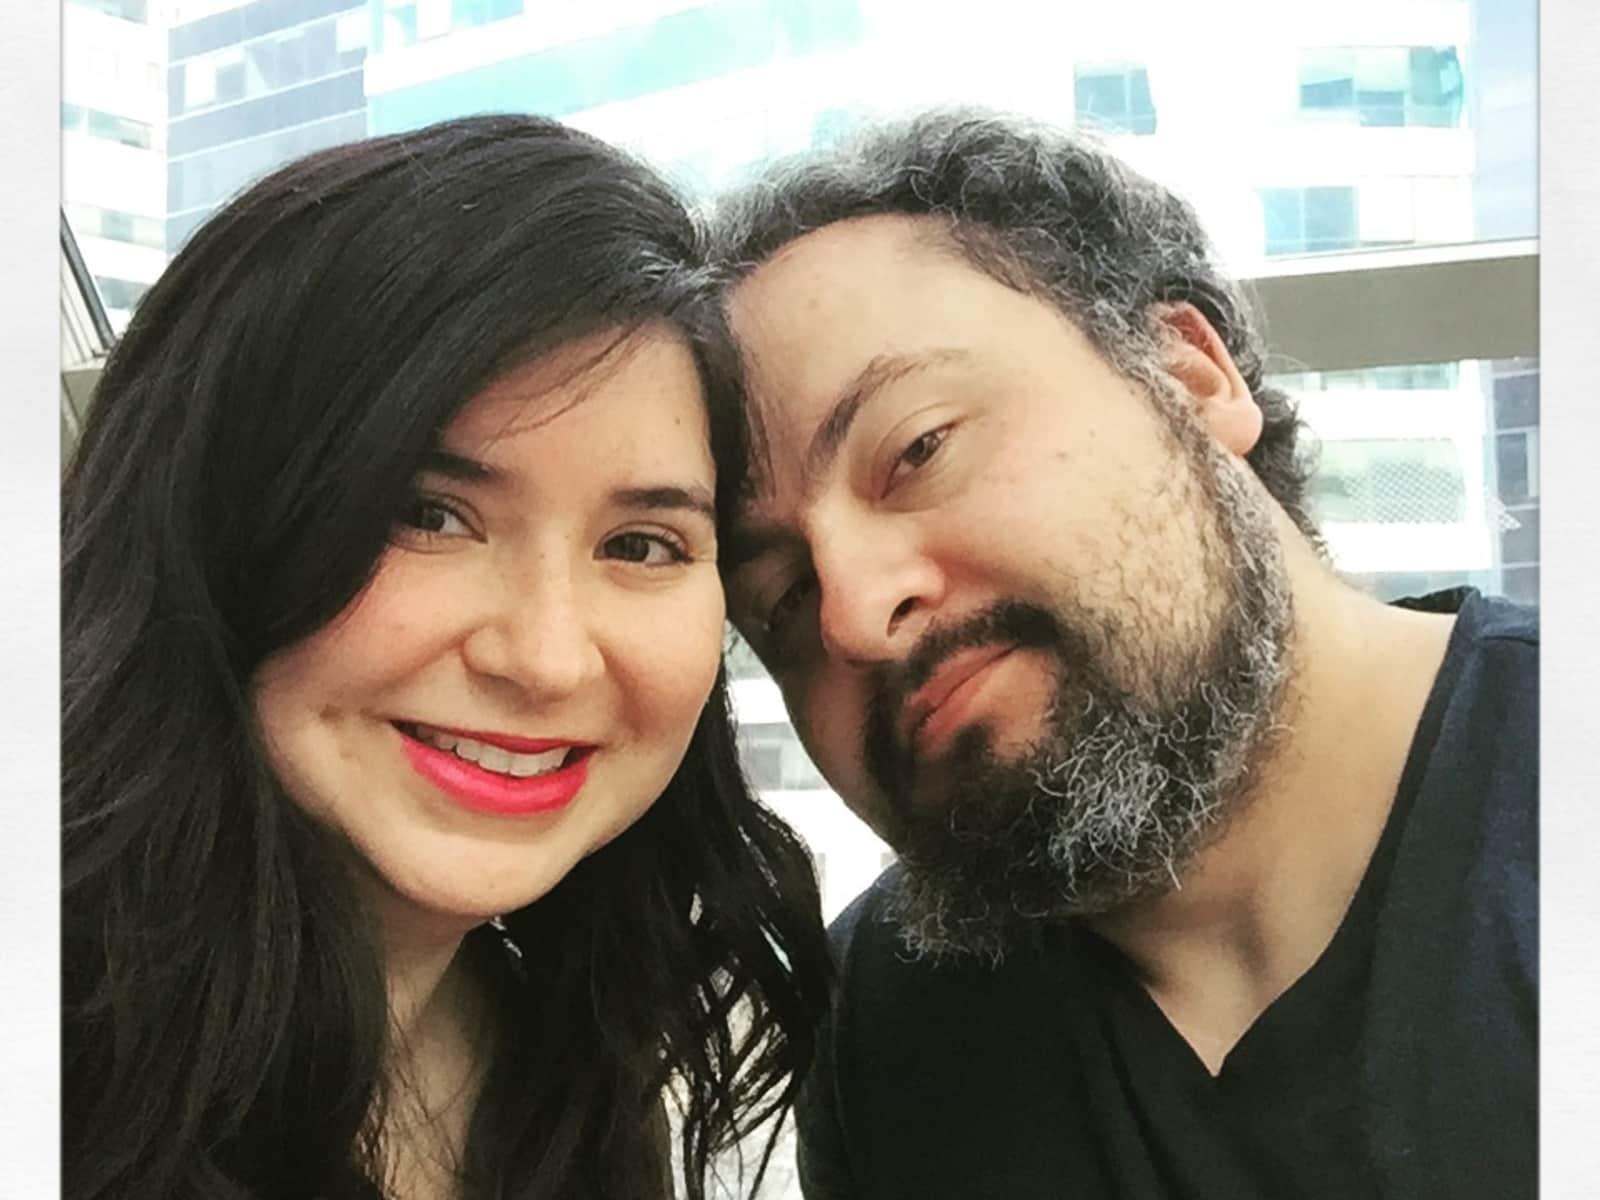 Sofía & Ivan from Santiago, Chile